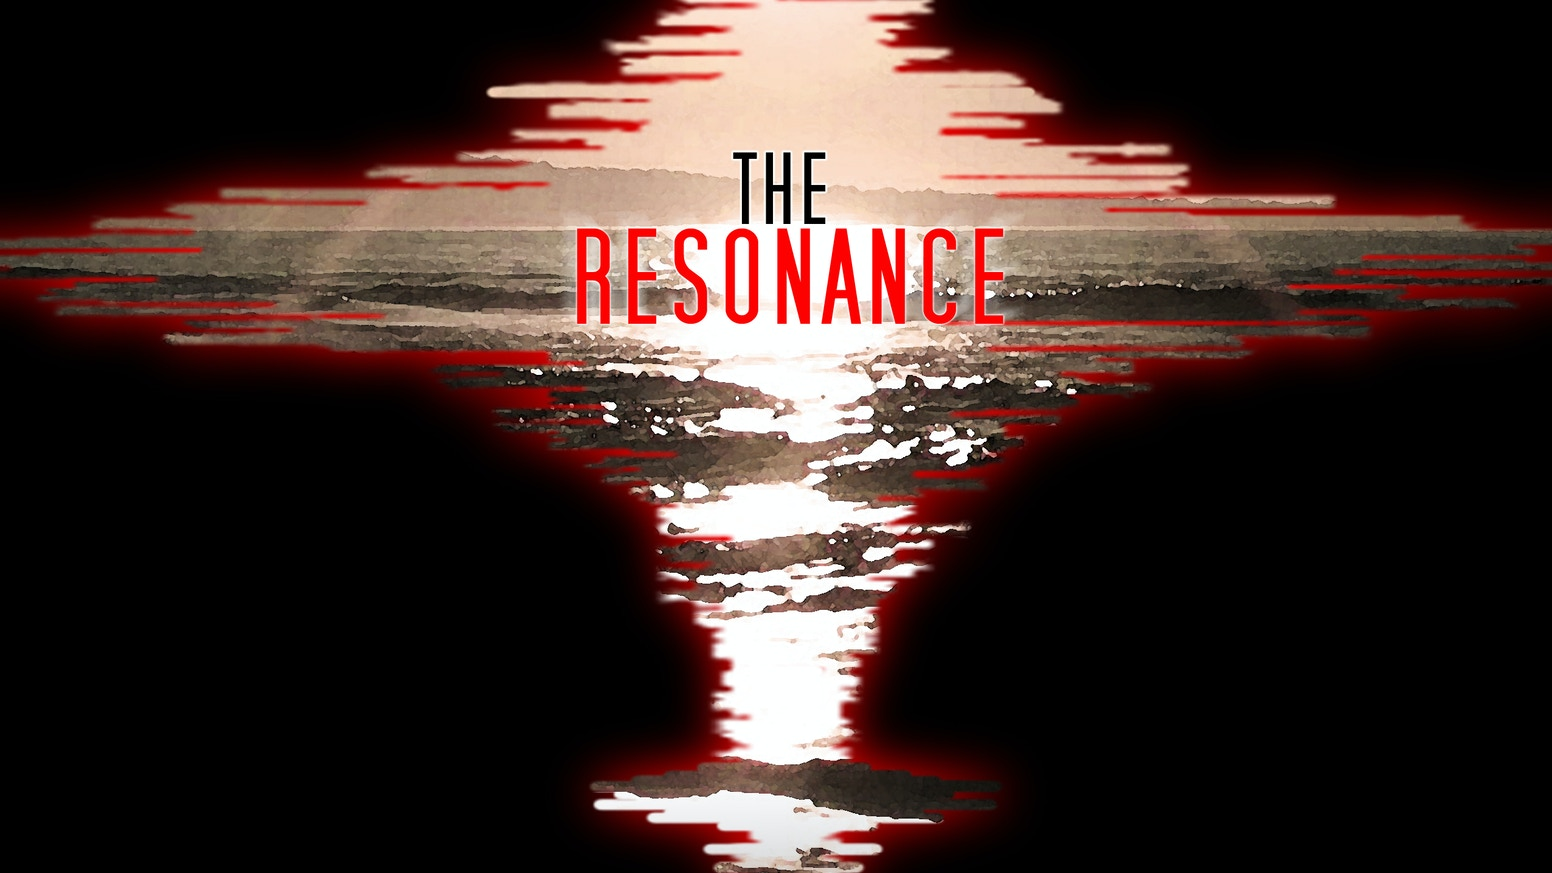 THE RESONANCE - Short Film by Andrew Lewis — Kickstarter